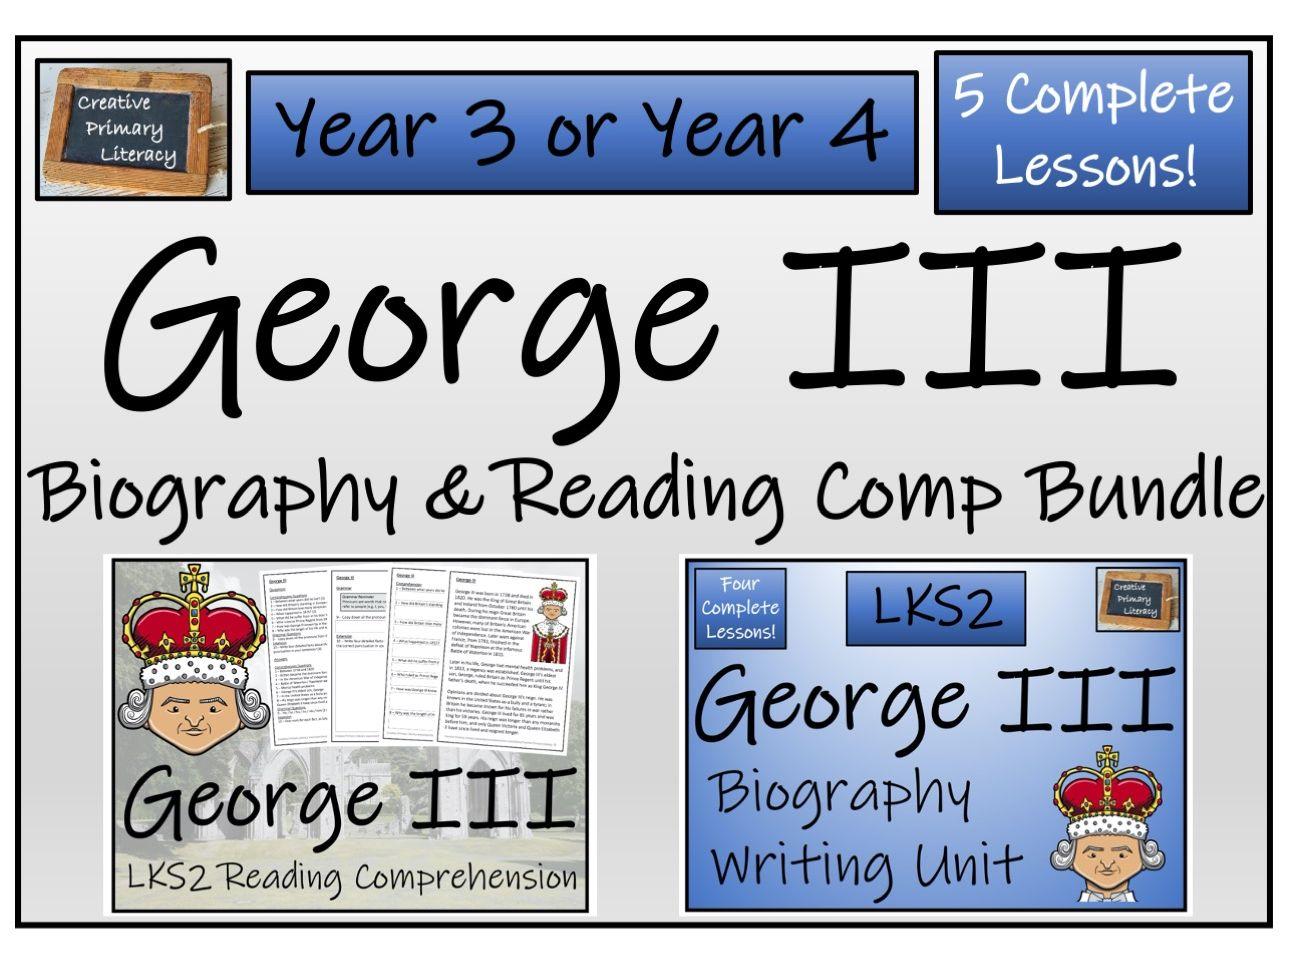 LKS2 George III Reading Comprehension & Biography Bundle